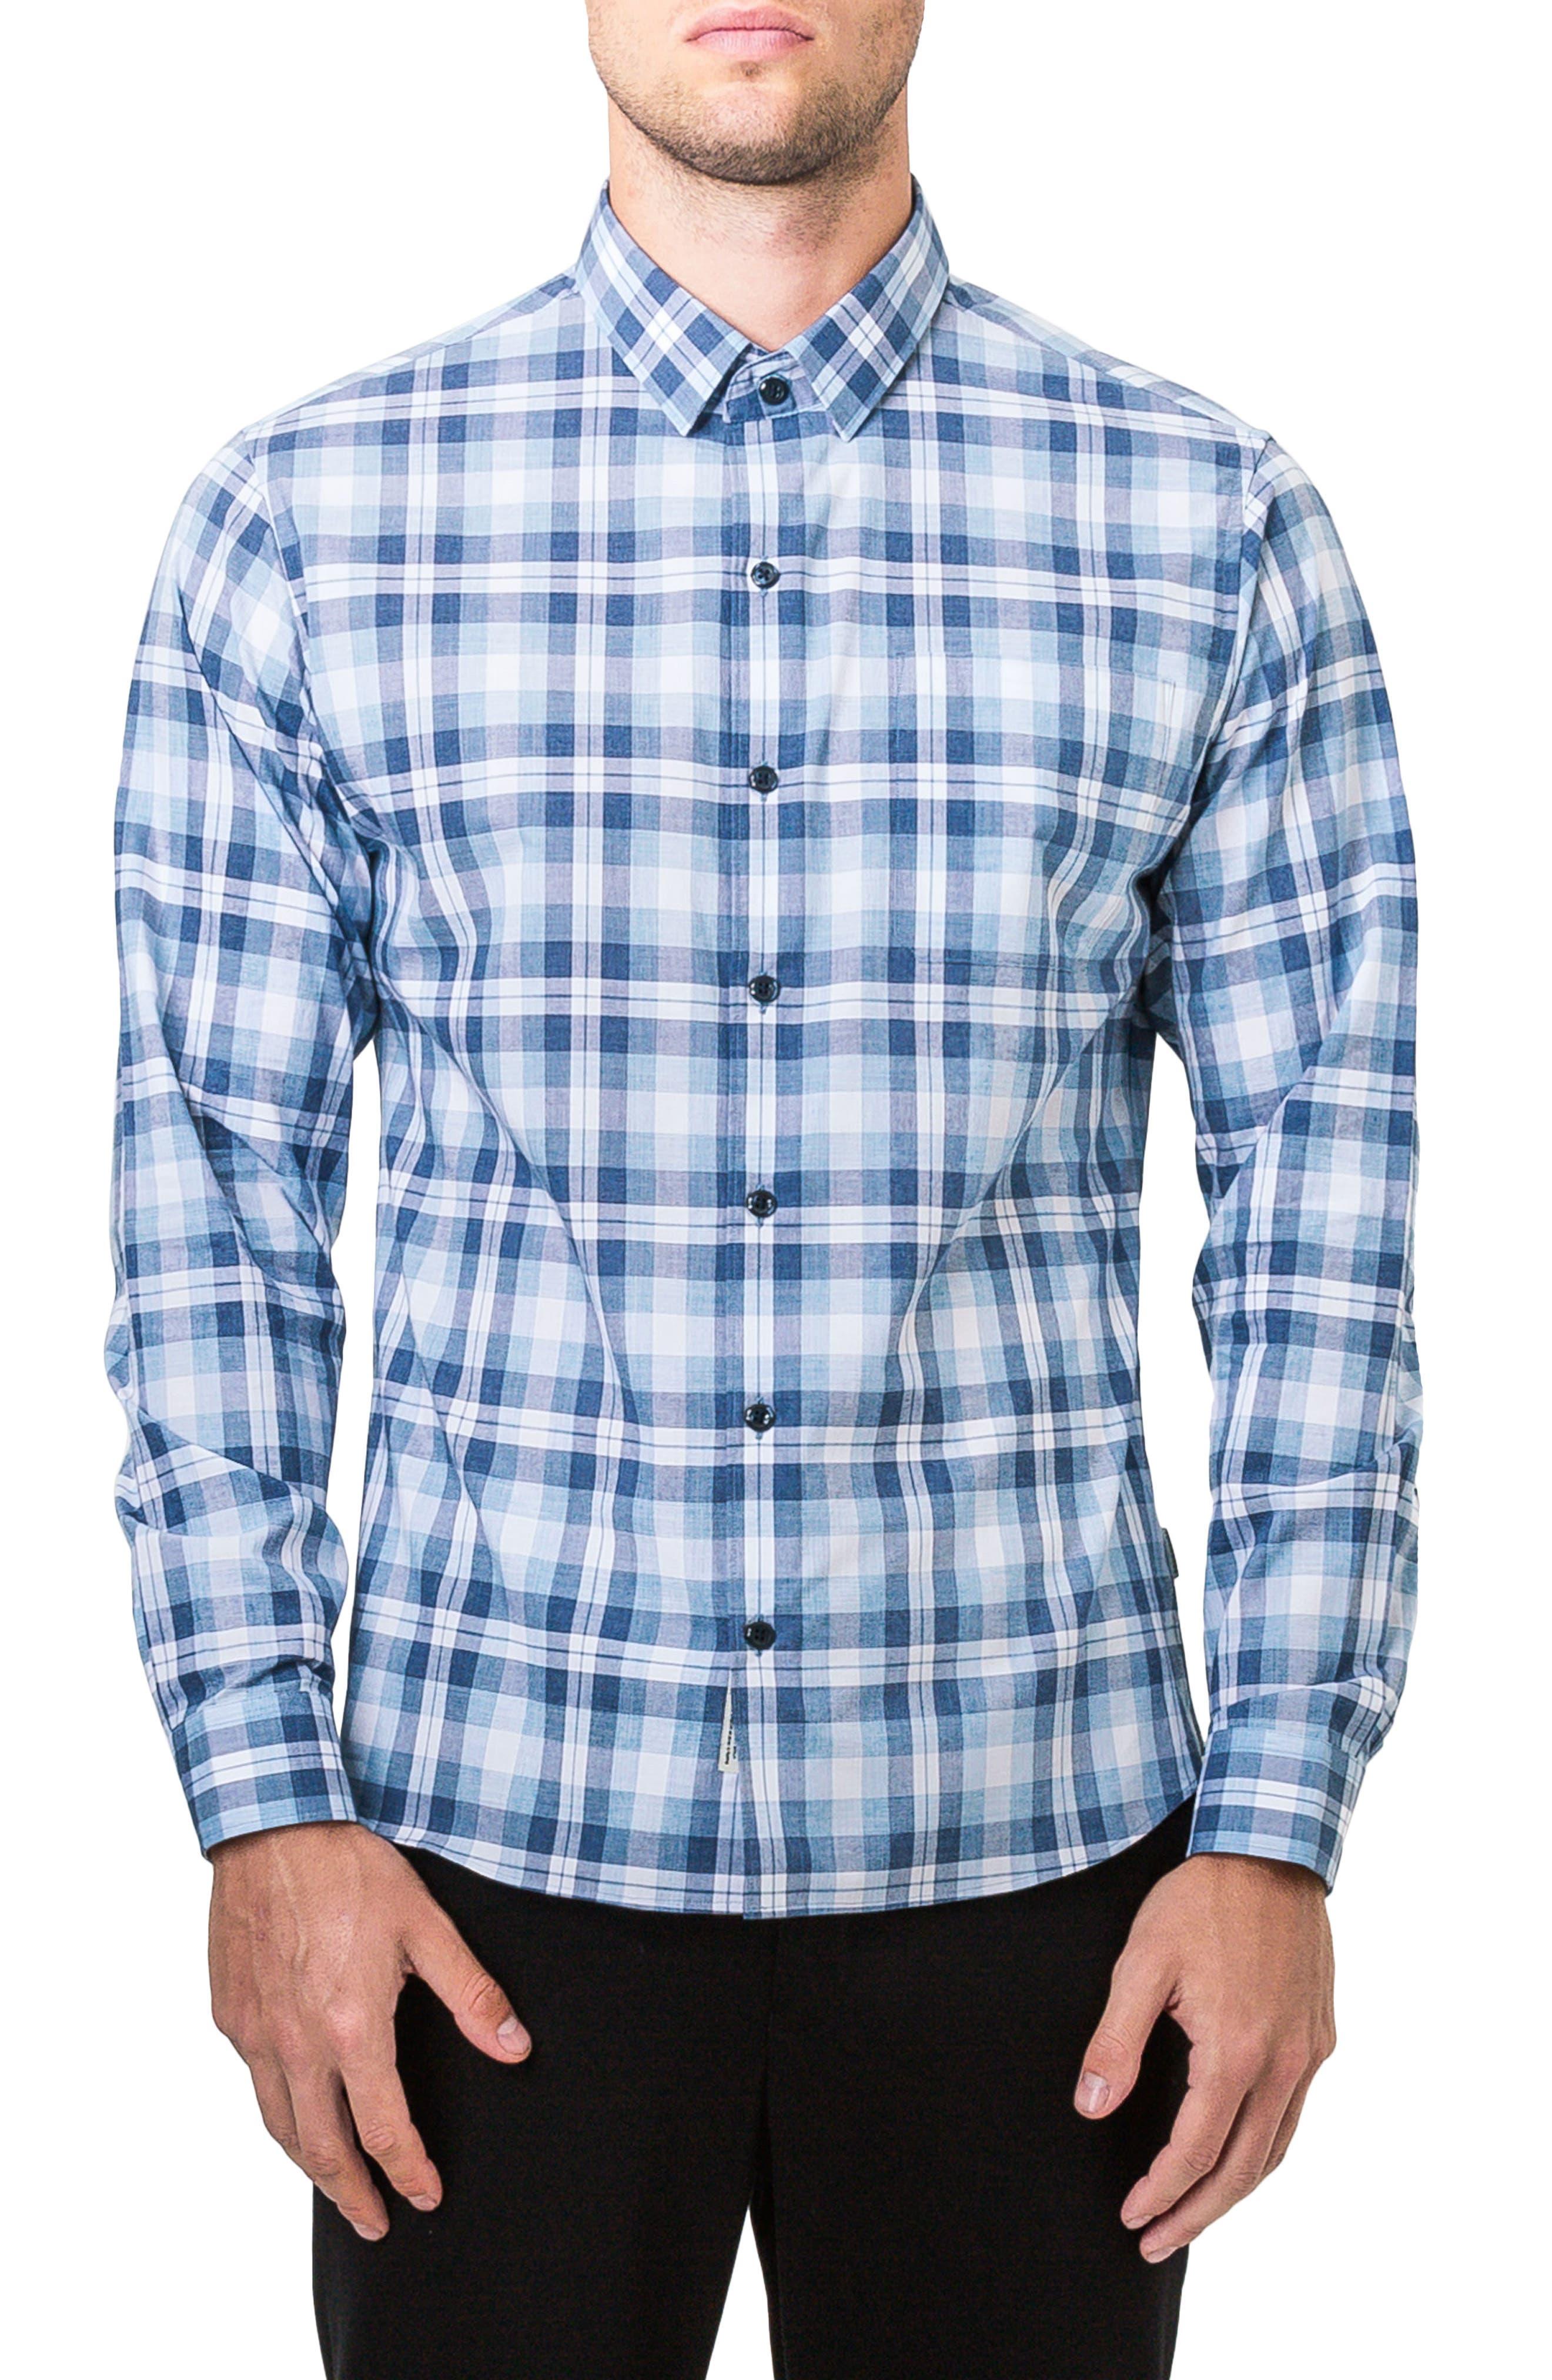 Morning Rain Woven Shirt,                             Main thumbnail 1, color,                             Blue